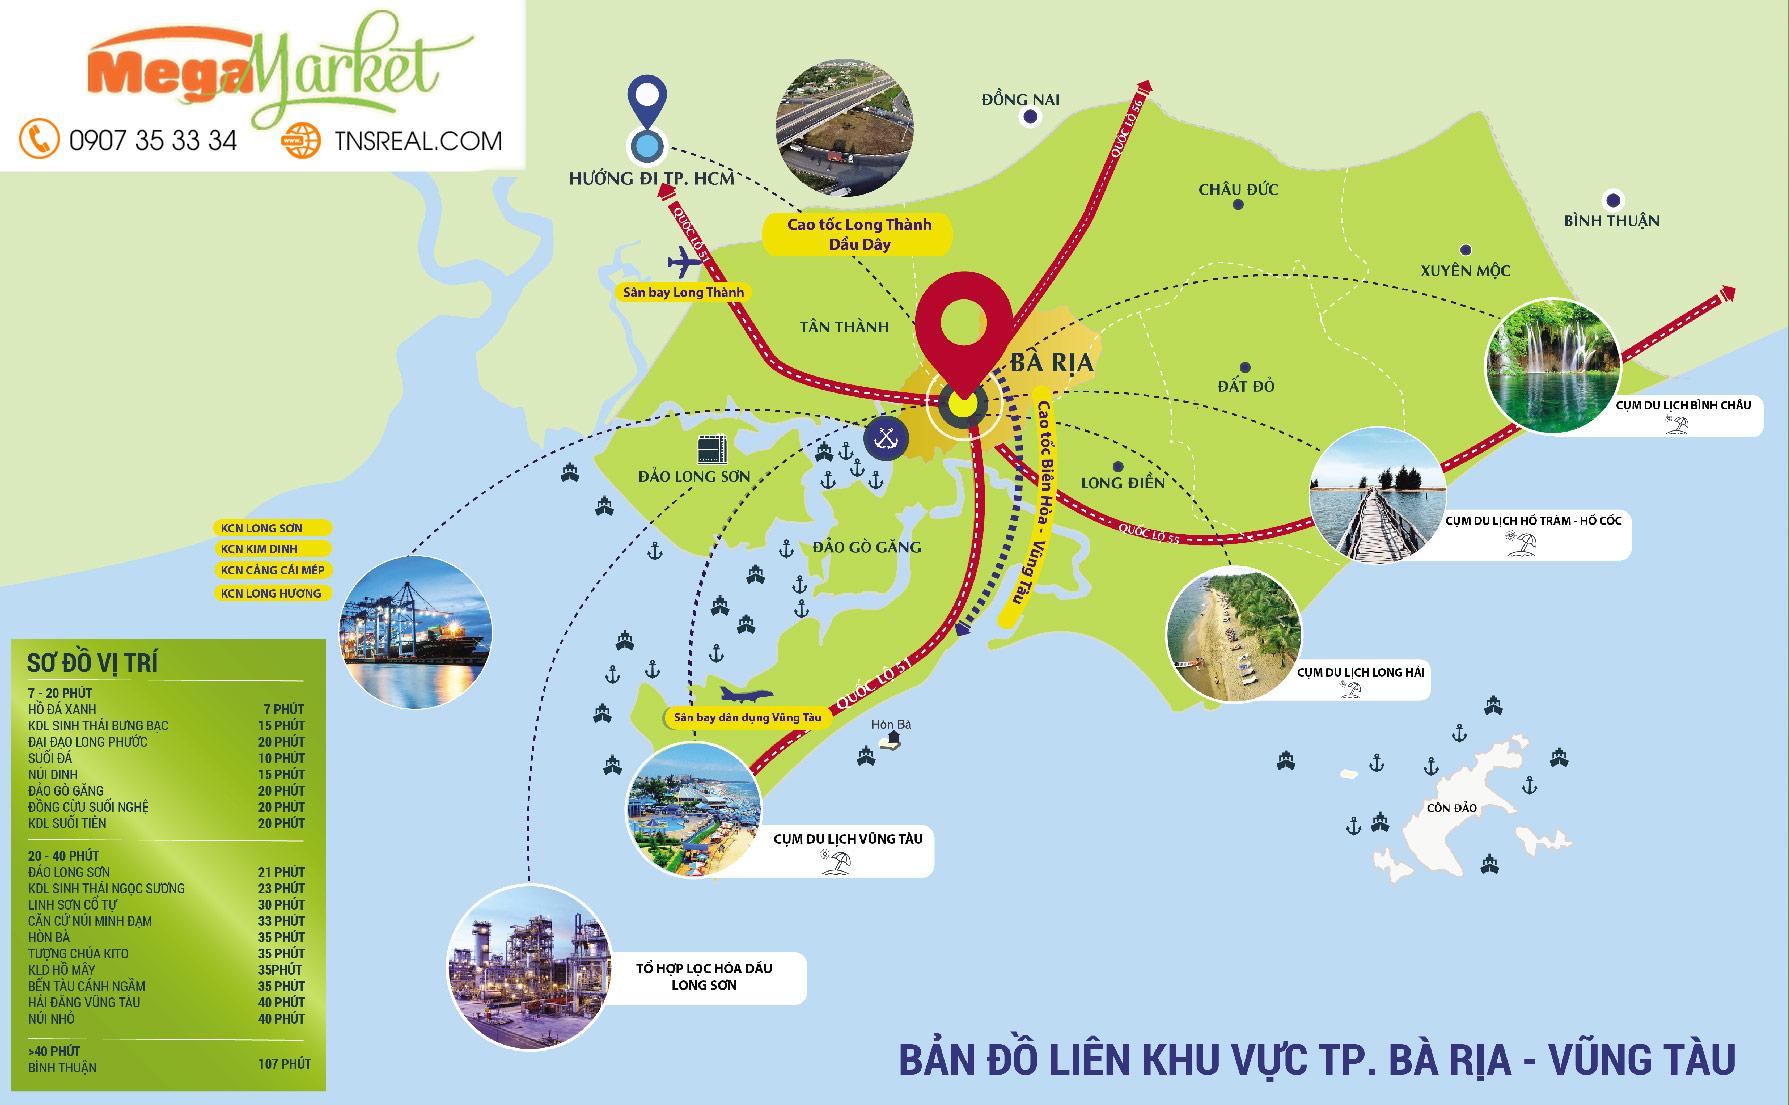 VI-TRI-mega-market-cho-kim-hai-vung-tau